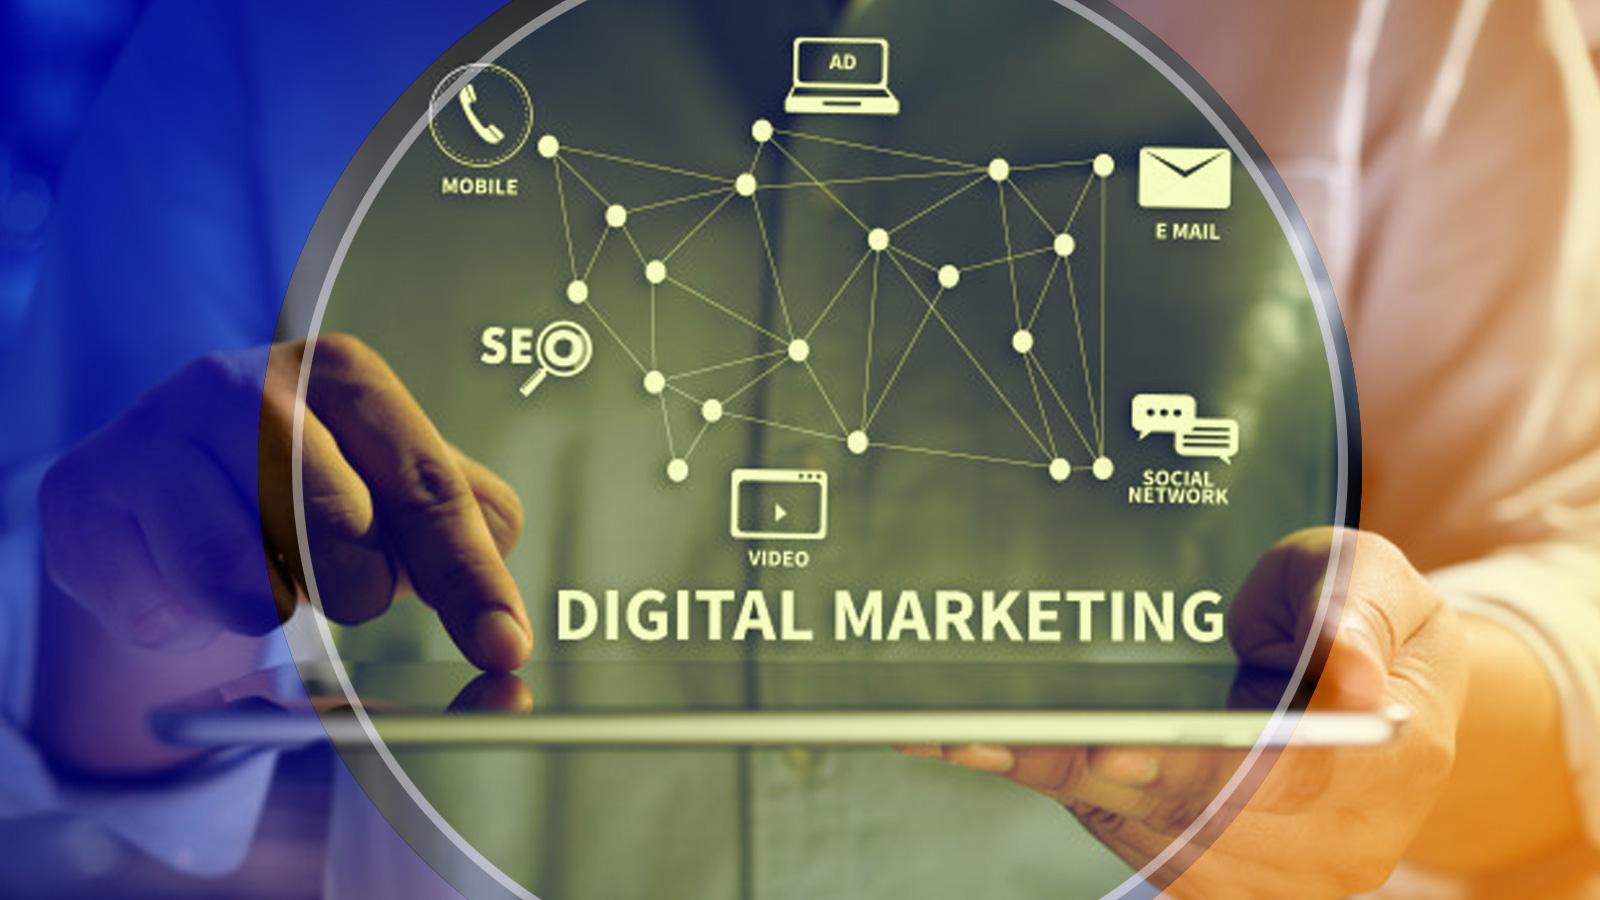 Top 5 Best Digital Marketing Agencies in Dubai